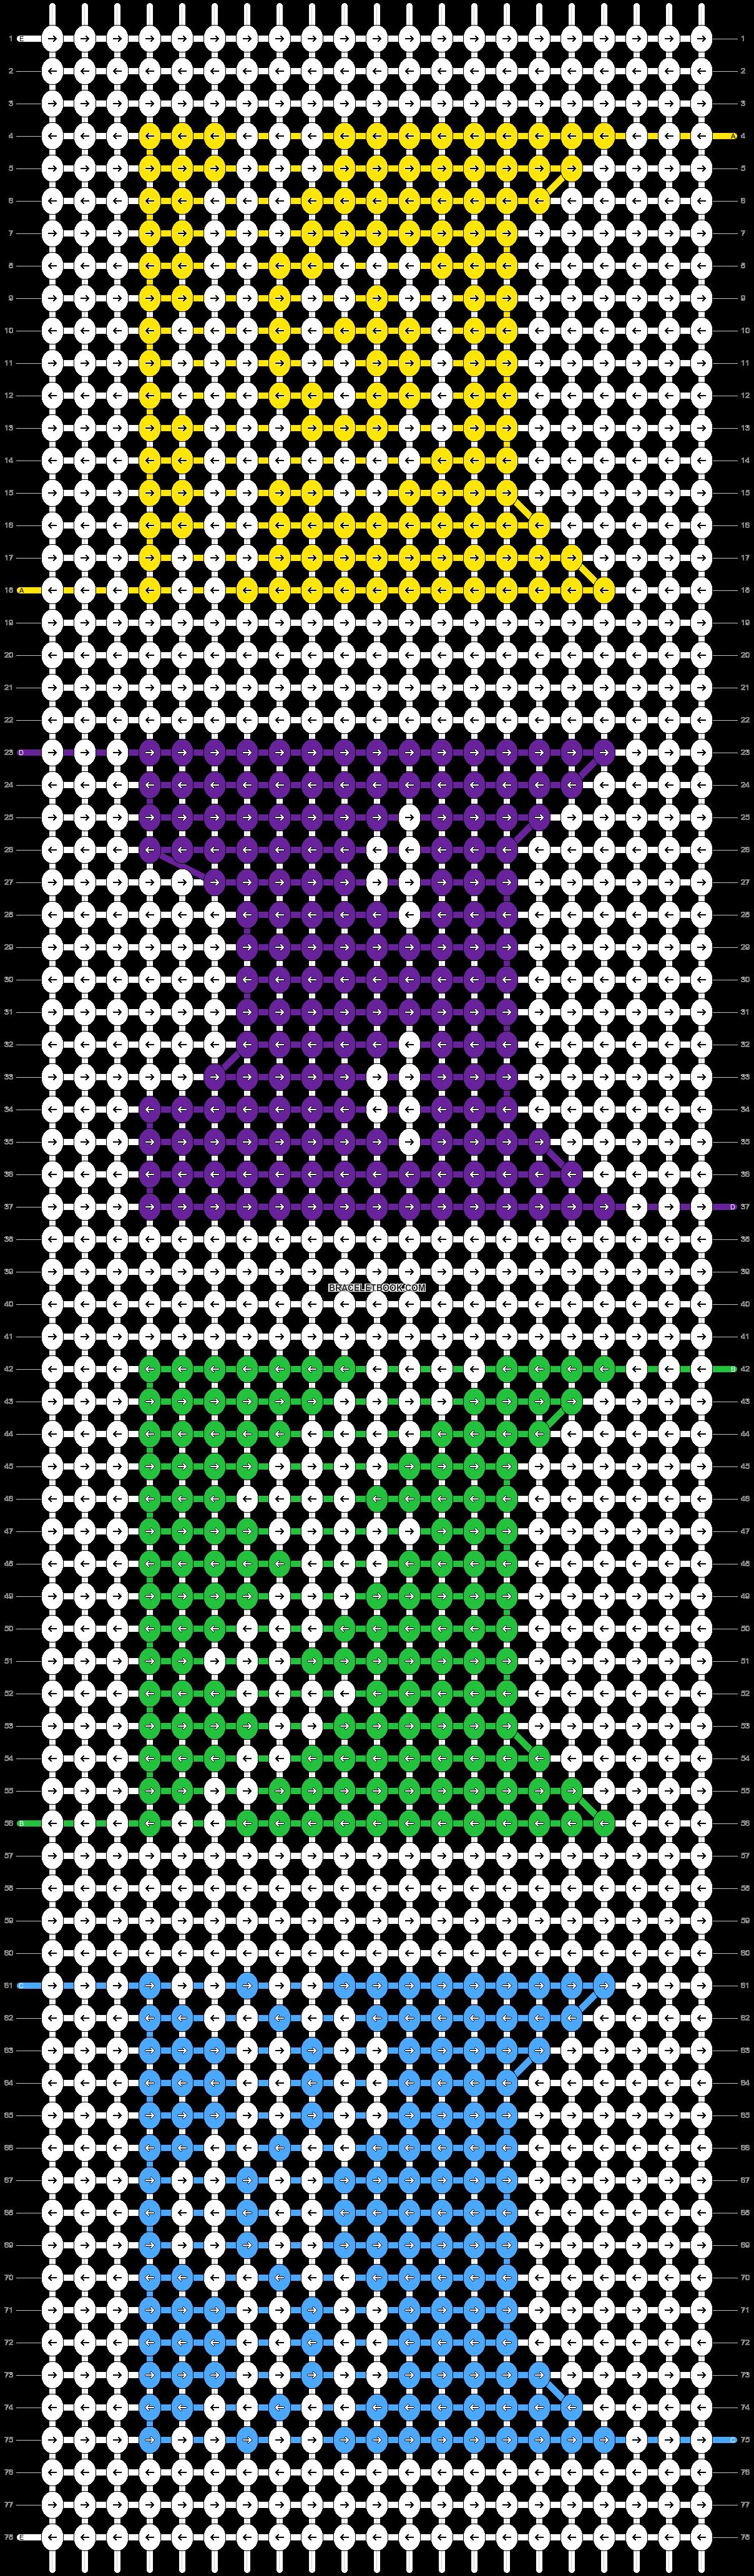 Alpha pattern #26526 pattern